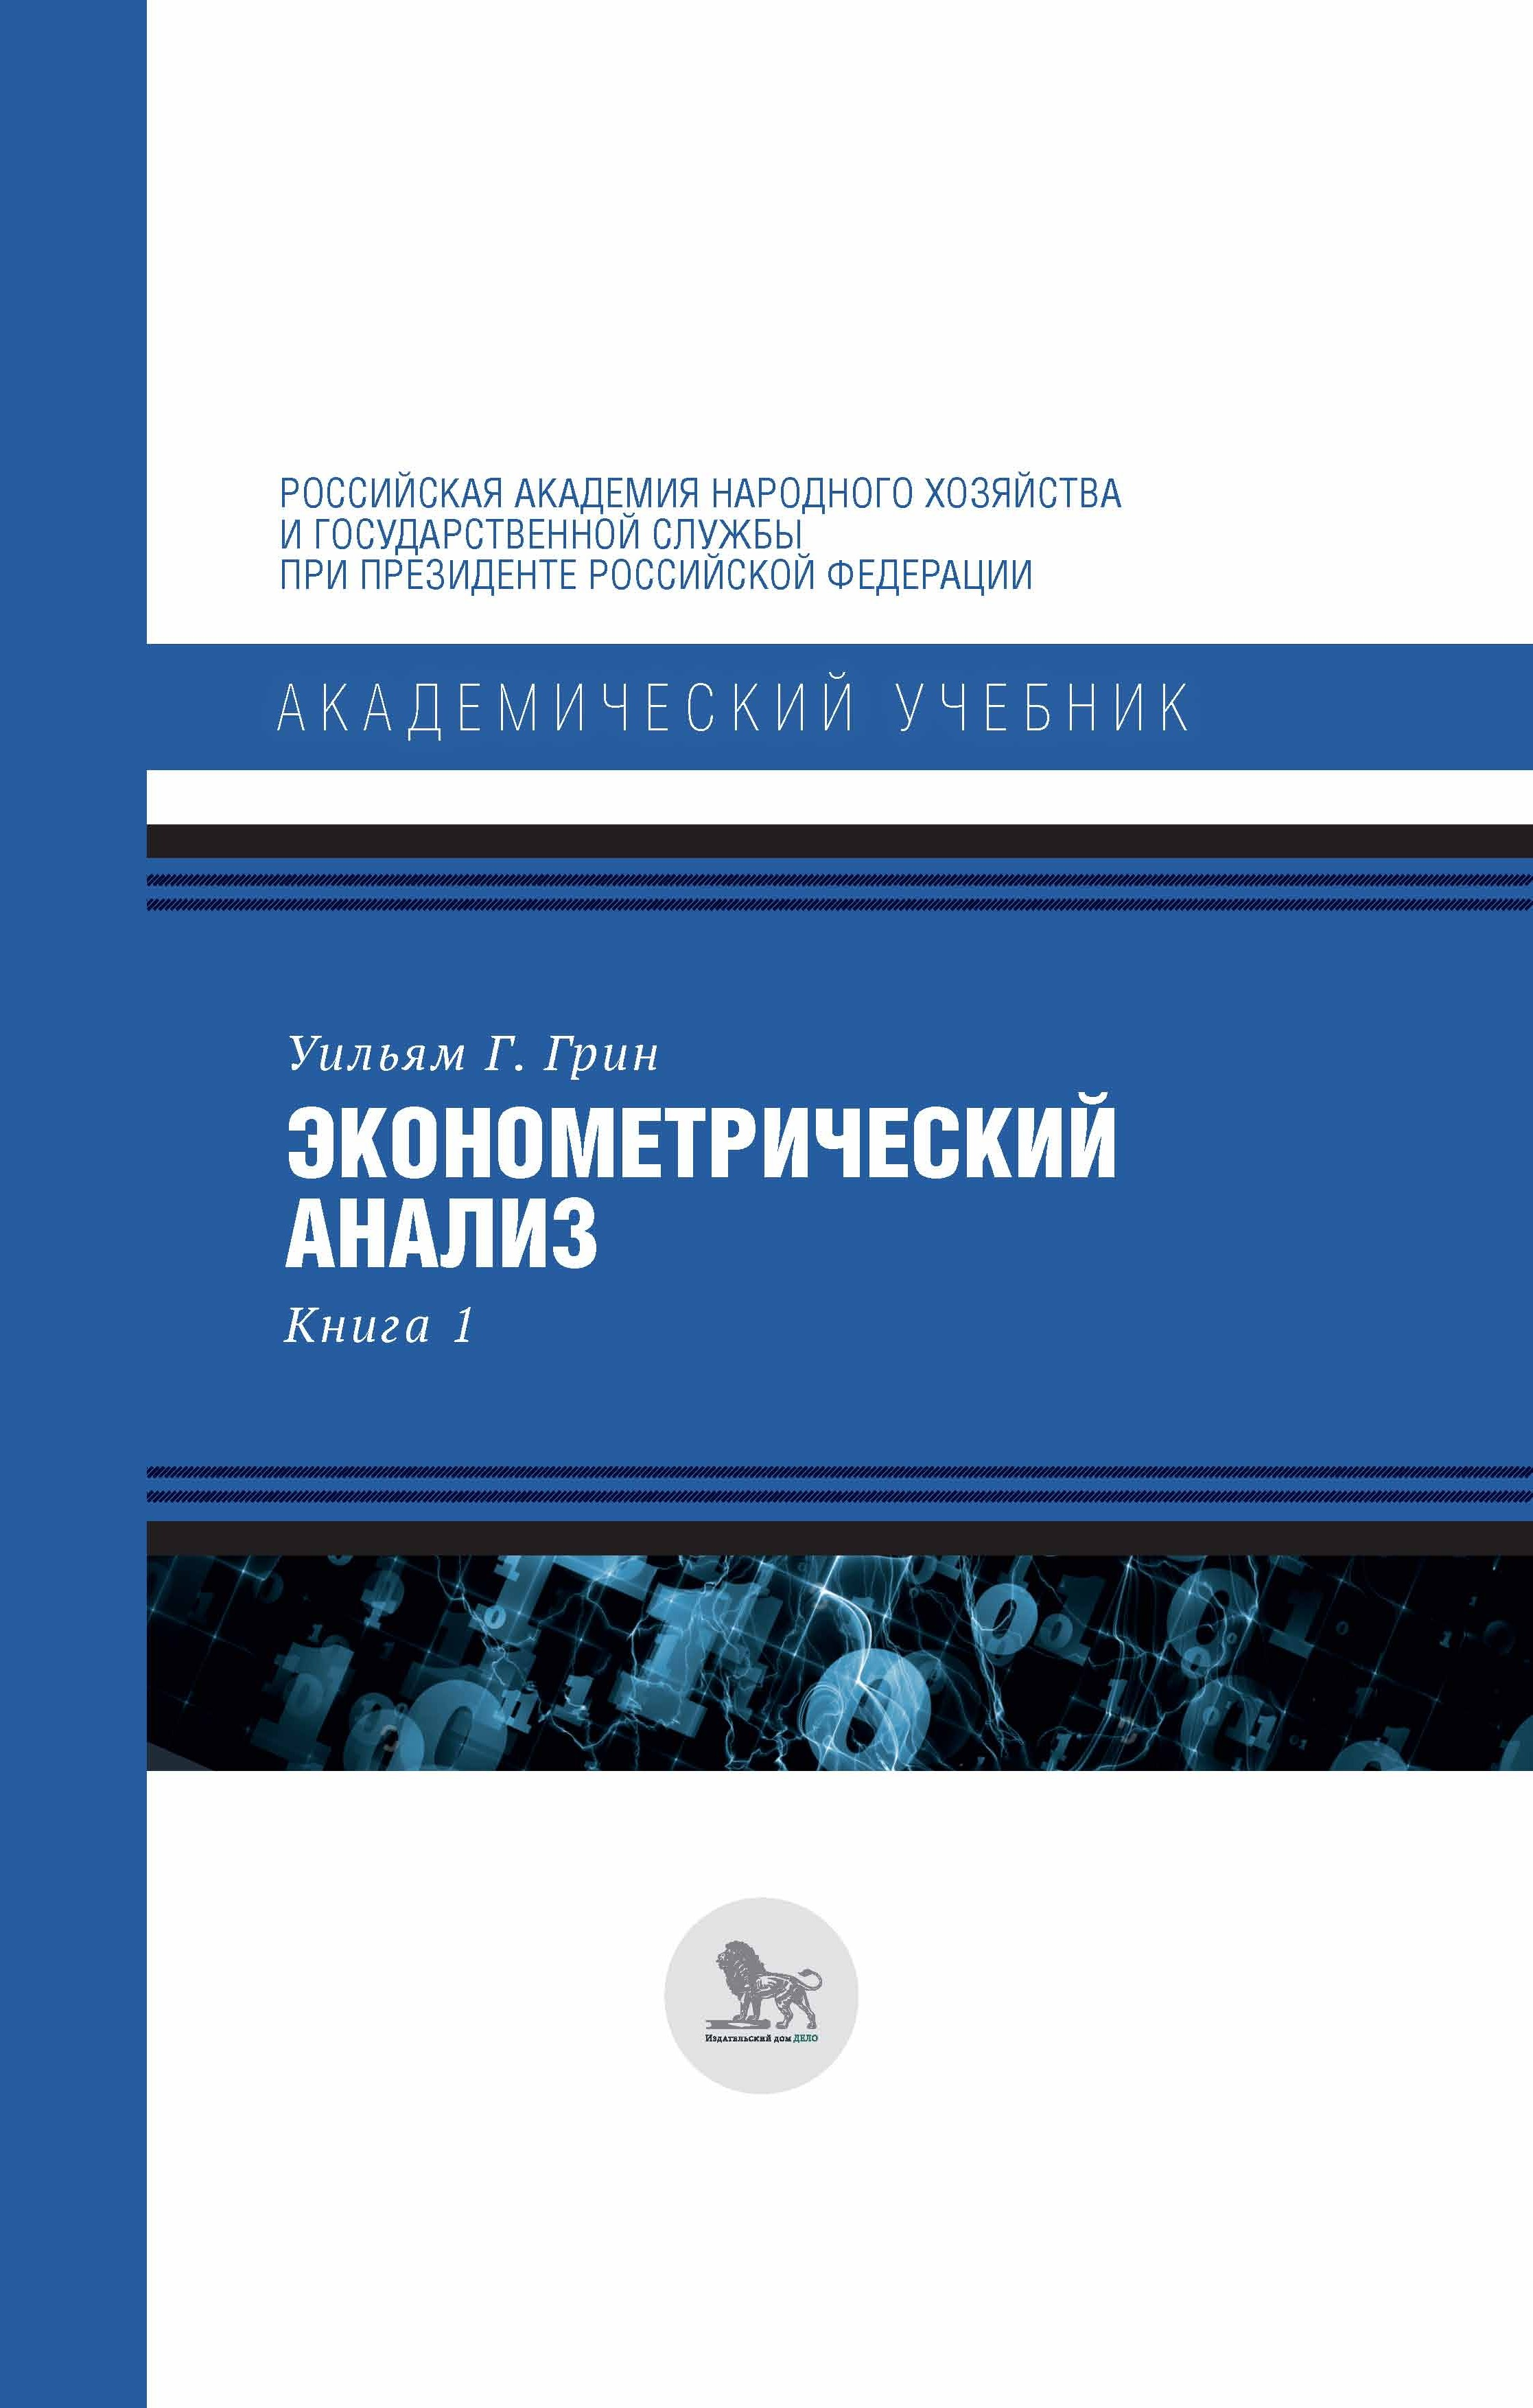 Уильям Г. Грин Эконометрический анализ. Книга 1 уильям грин эконометрический анализ книга 2